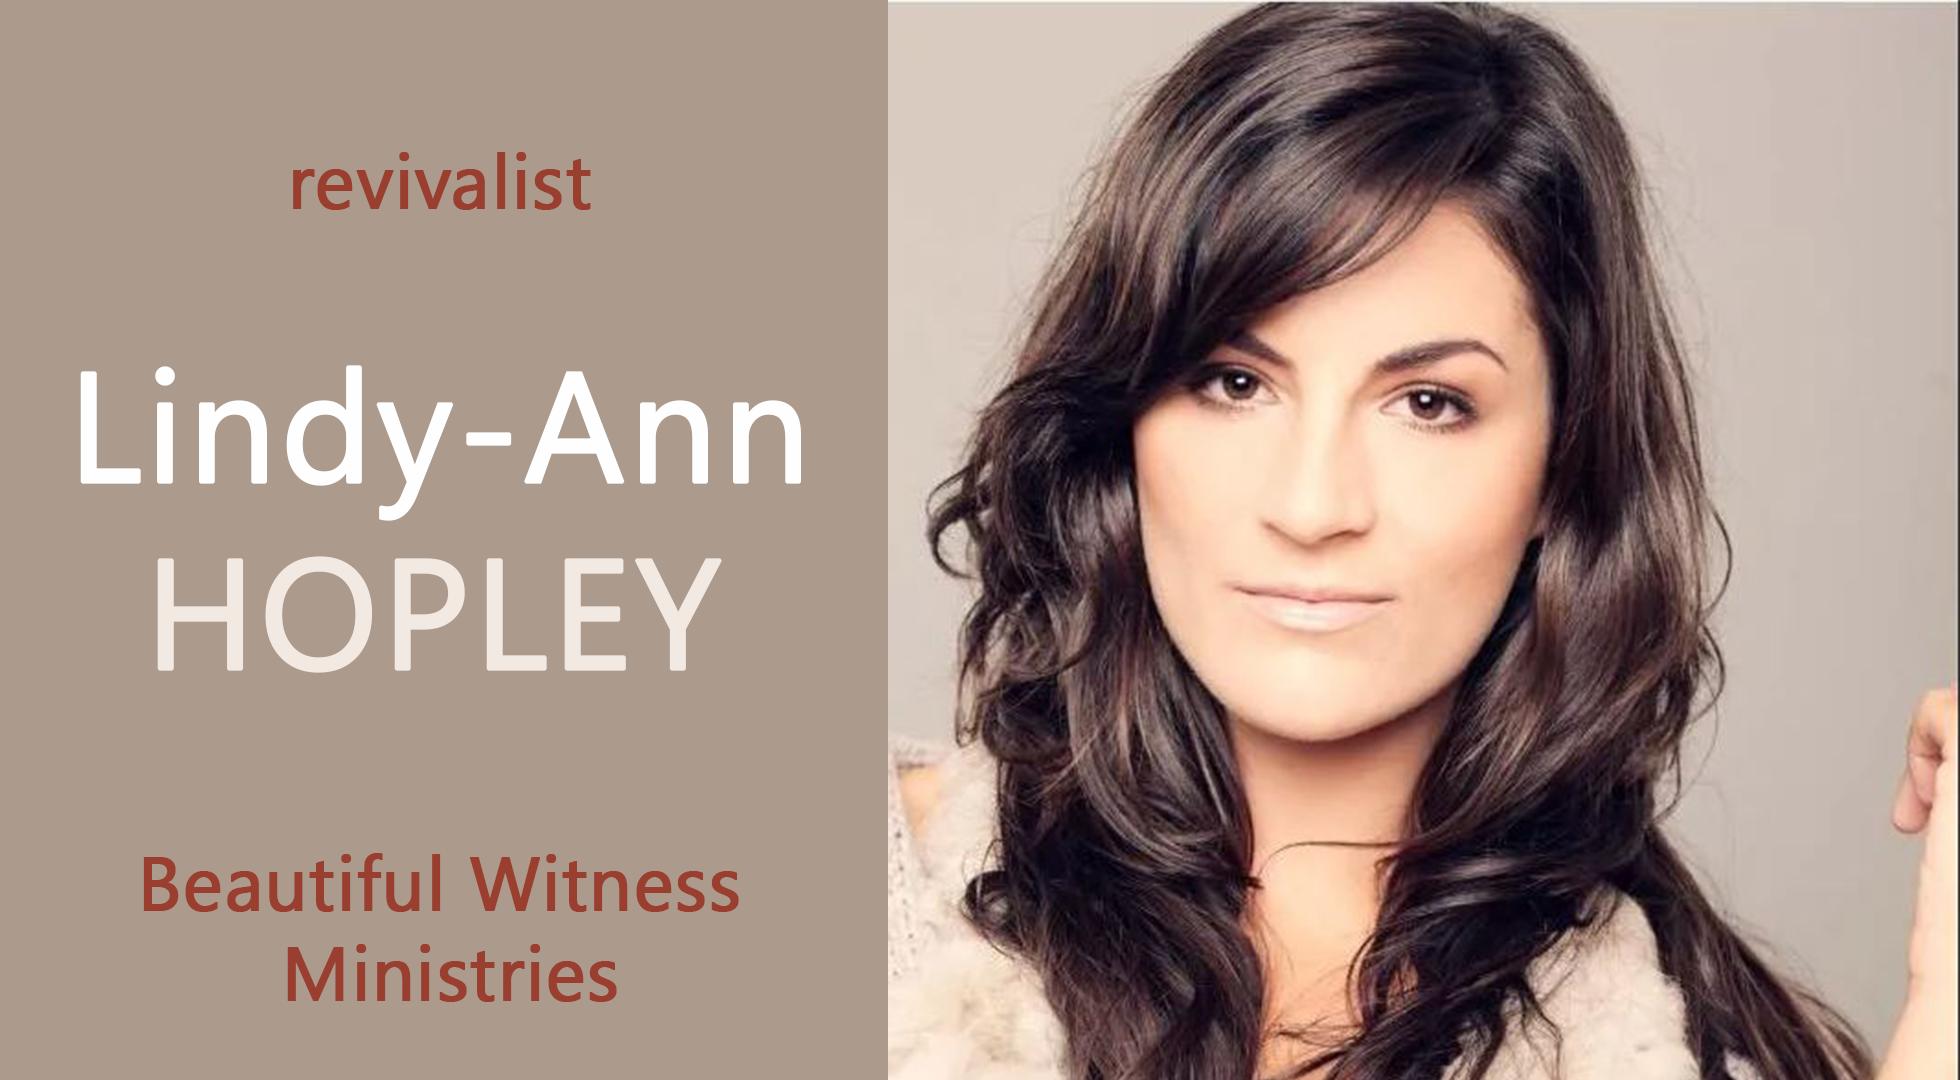 Lindy-Ann Hopley